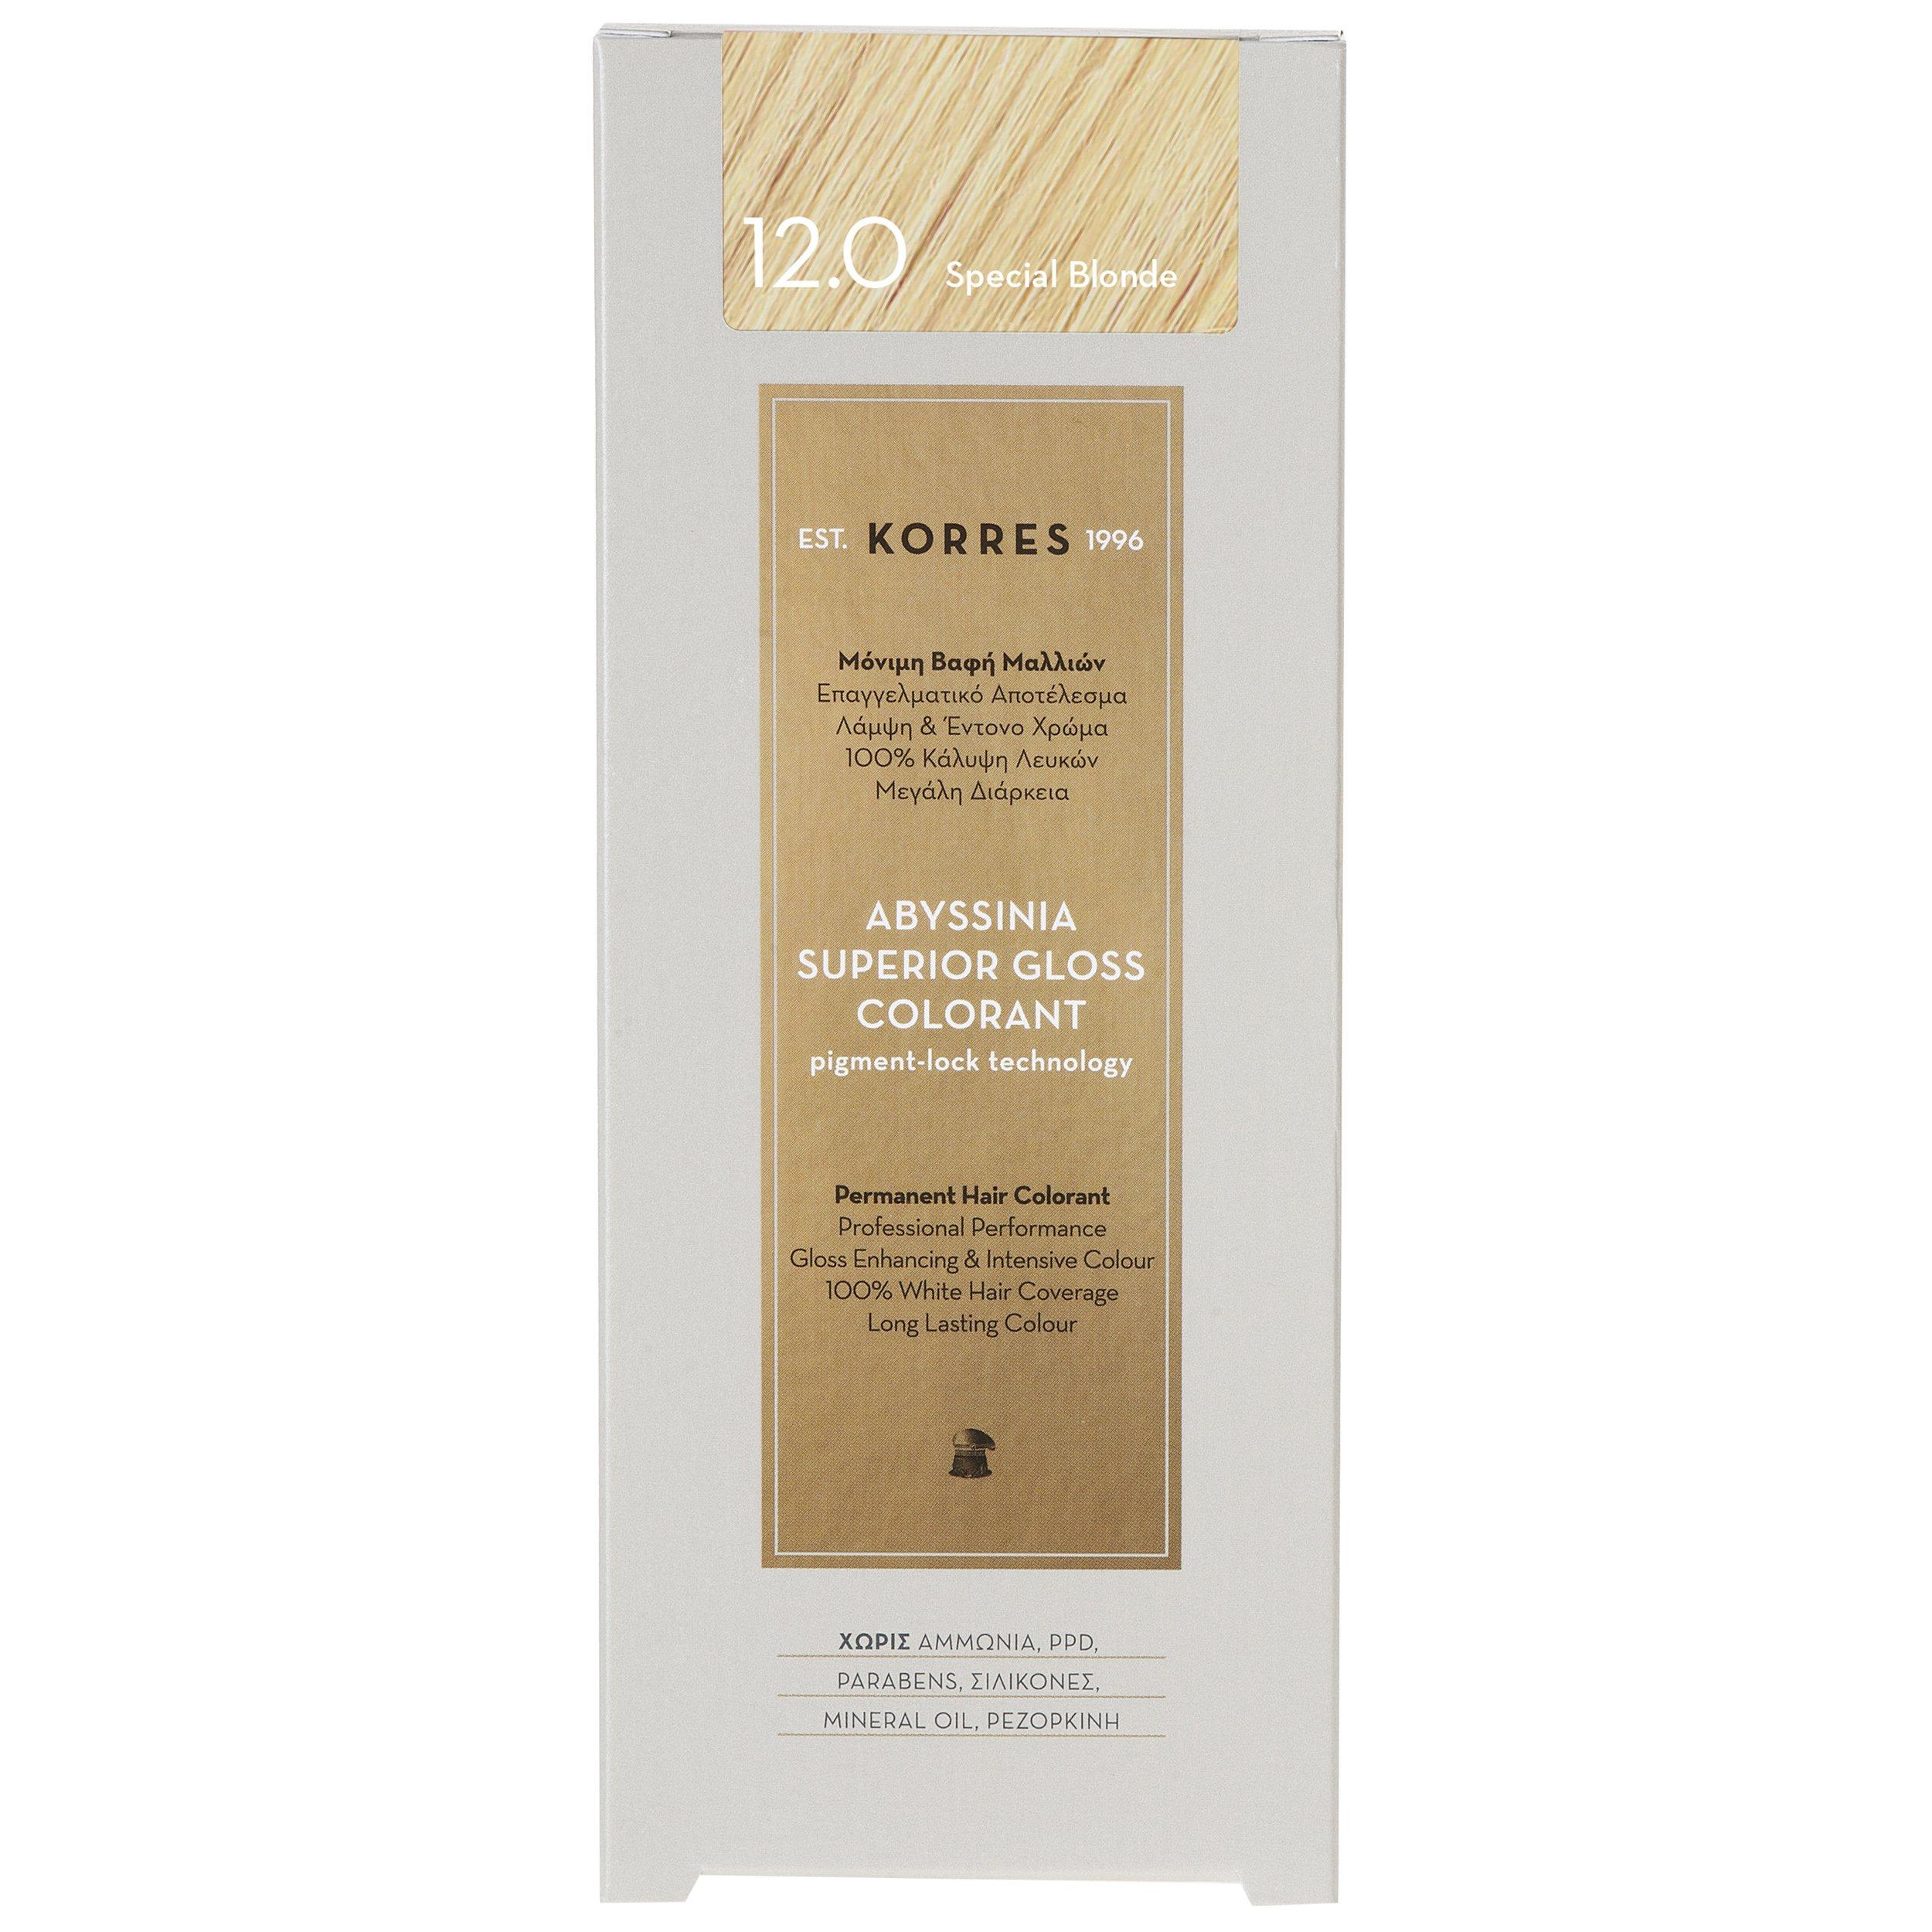 Korres Abyssinia Superior Gloss Colorant Επαγγελματικό Αποτέλεσμα Λάμψη & Έντονο Χρώμα – 12.0 SPECIAL BLONDE